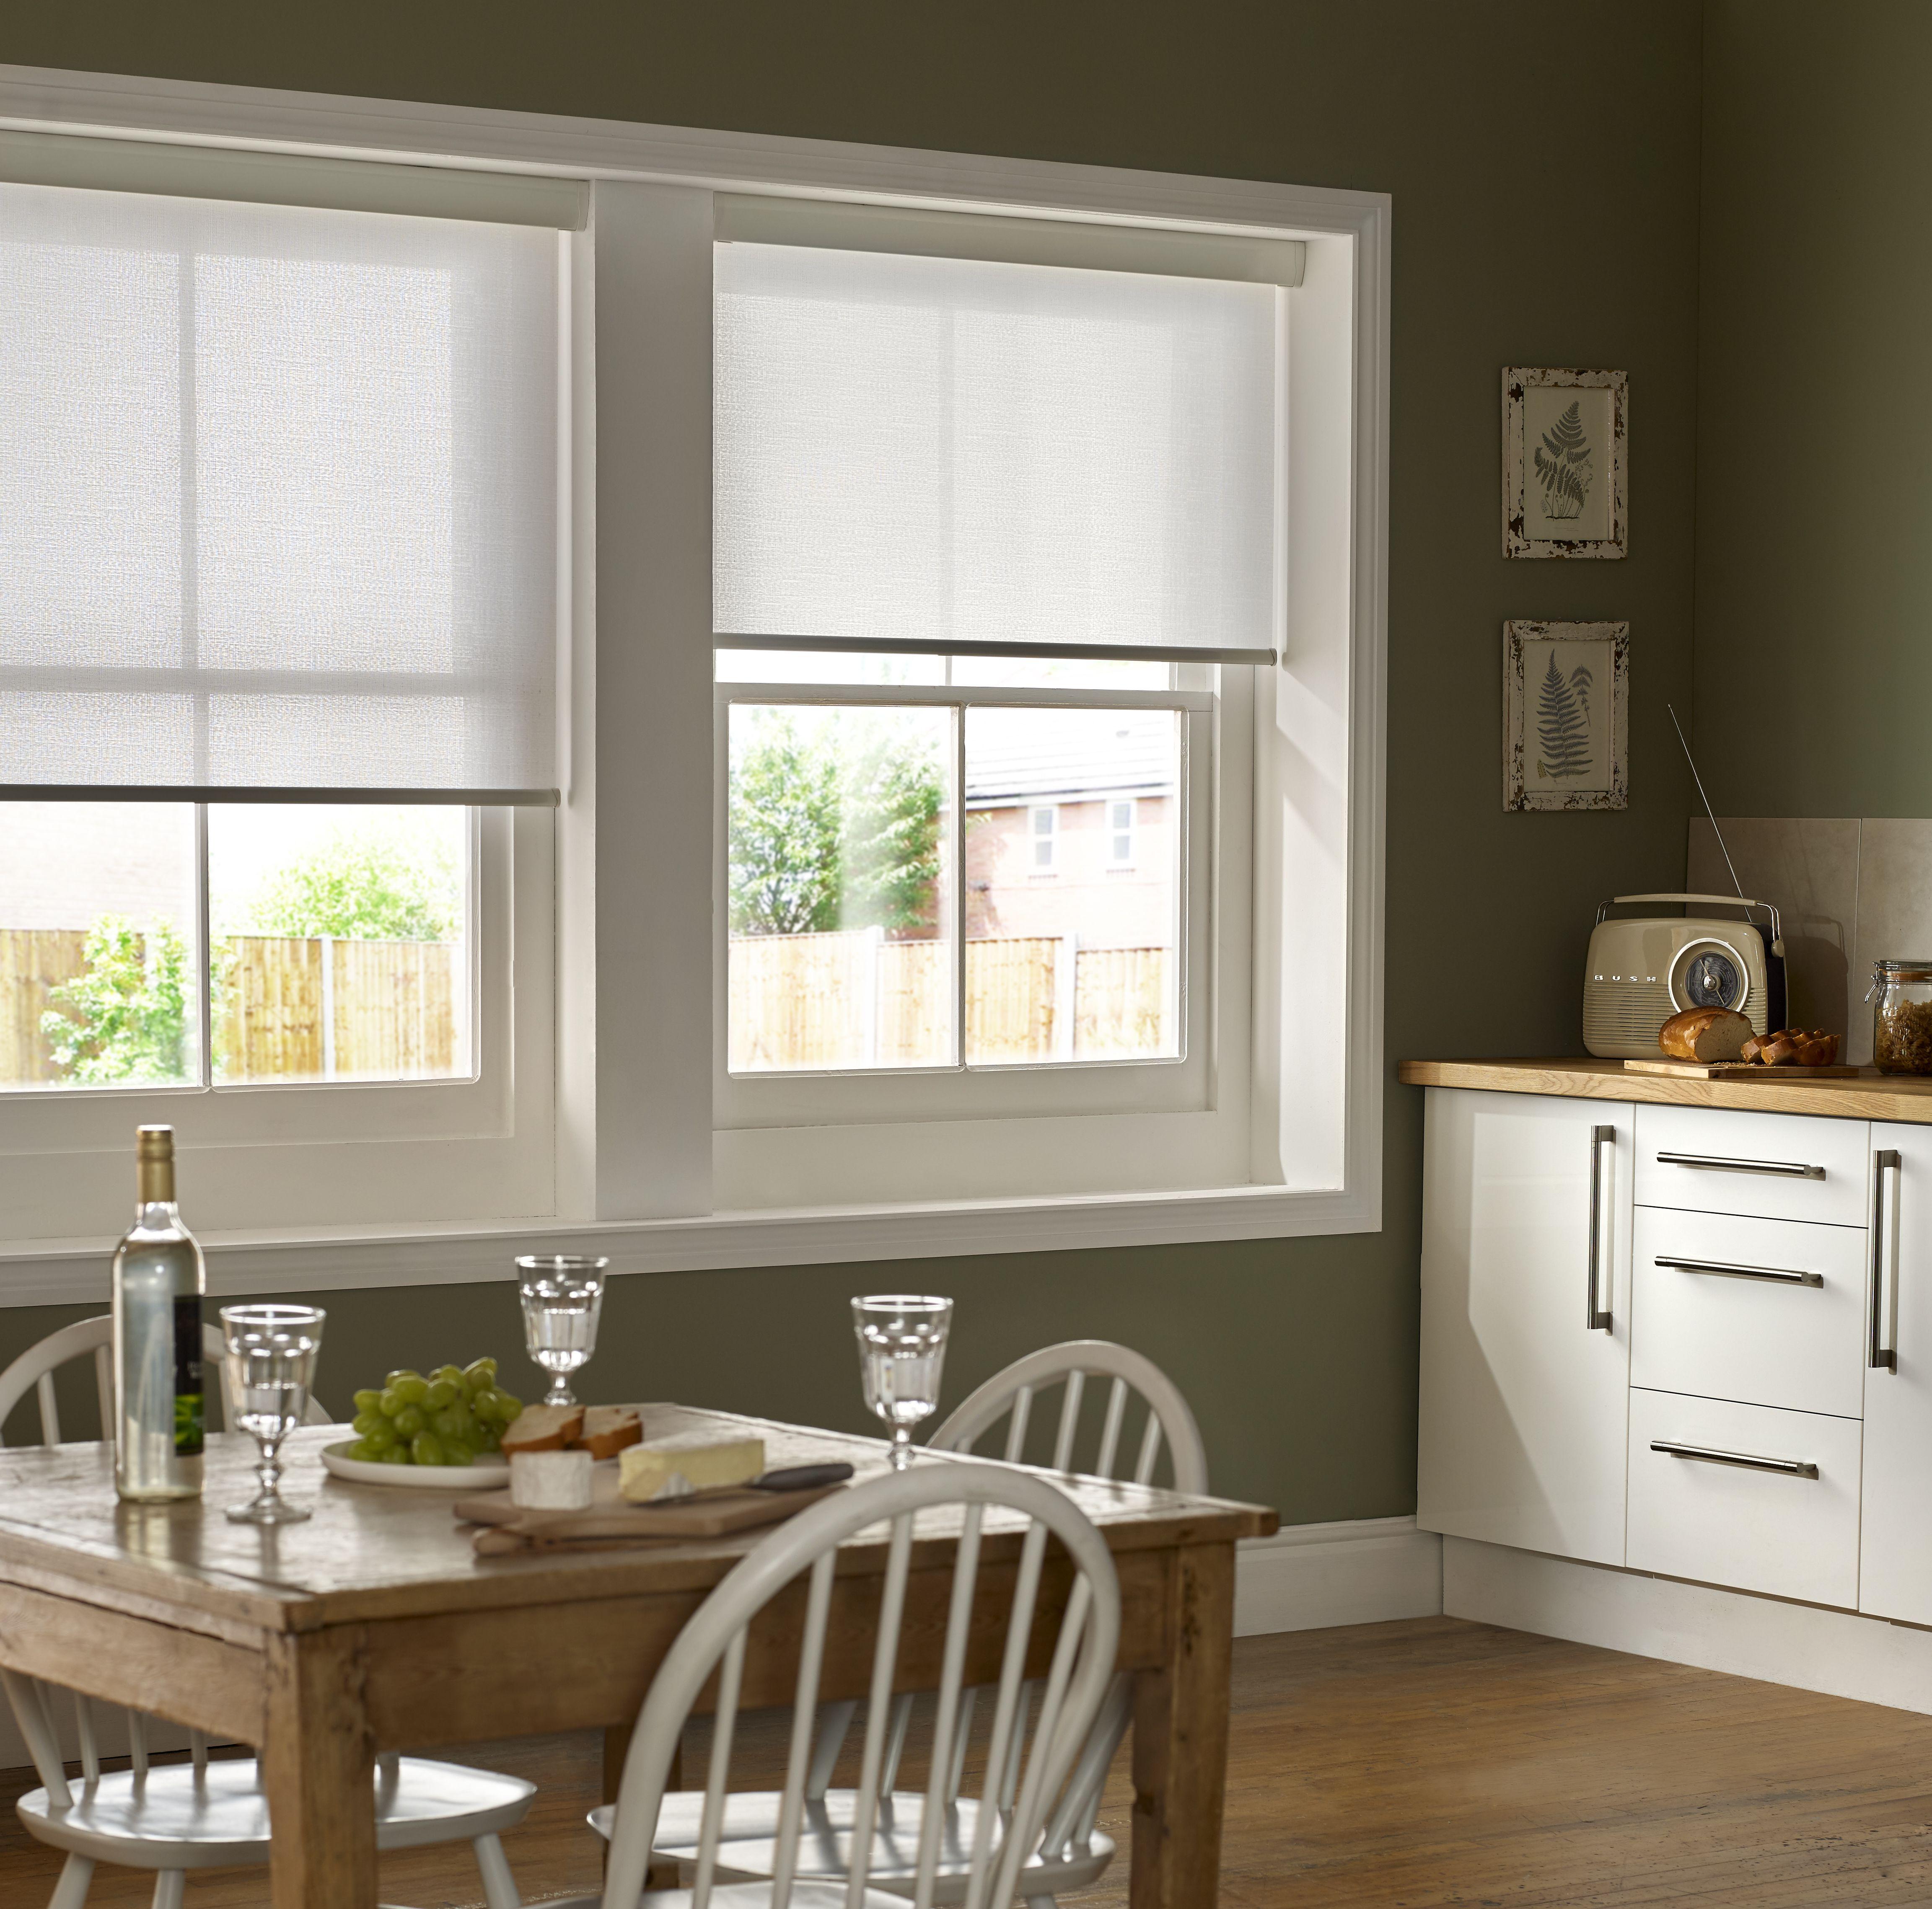 home bling bling for your windows custom roller shades. Black Bedroom Furniture Sets. Home Design Ideas